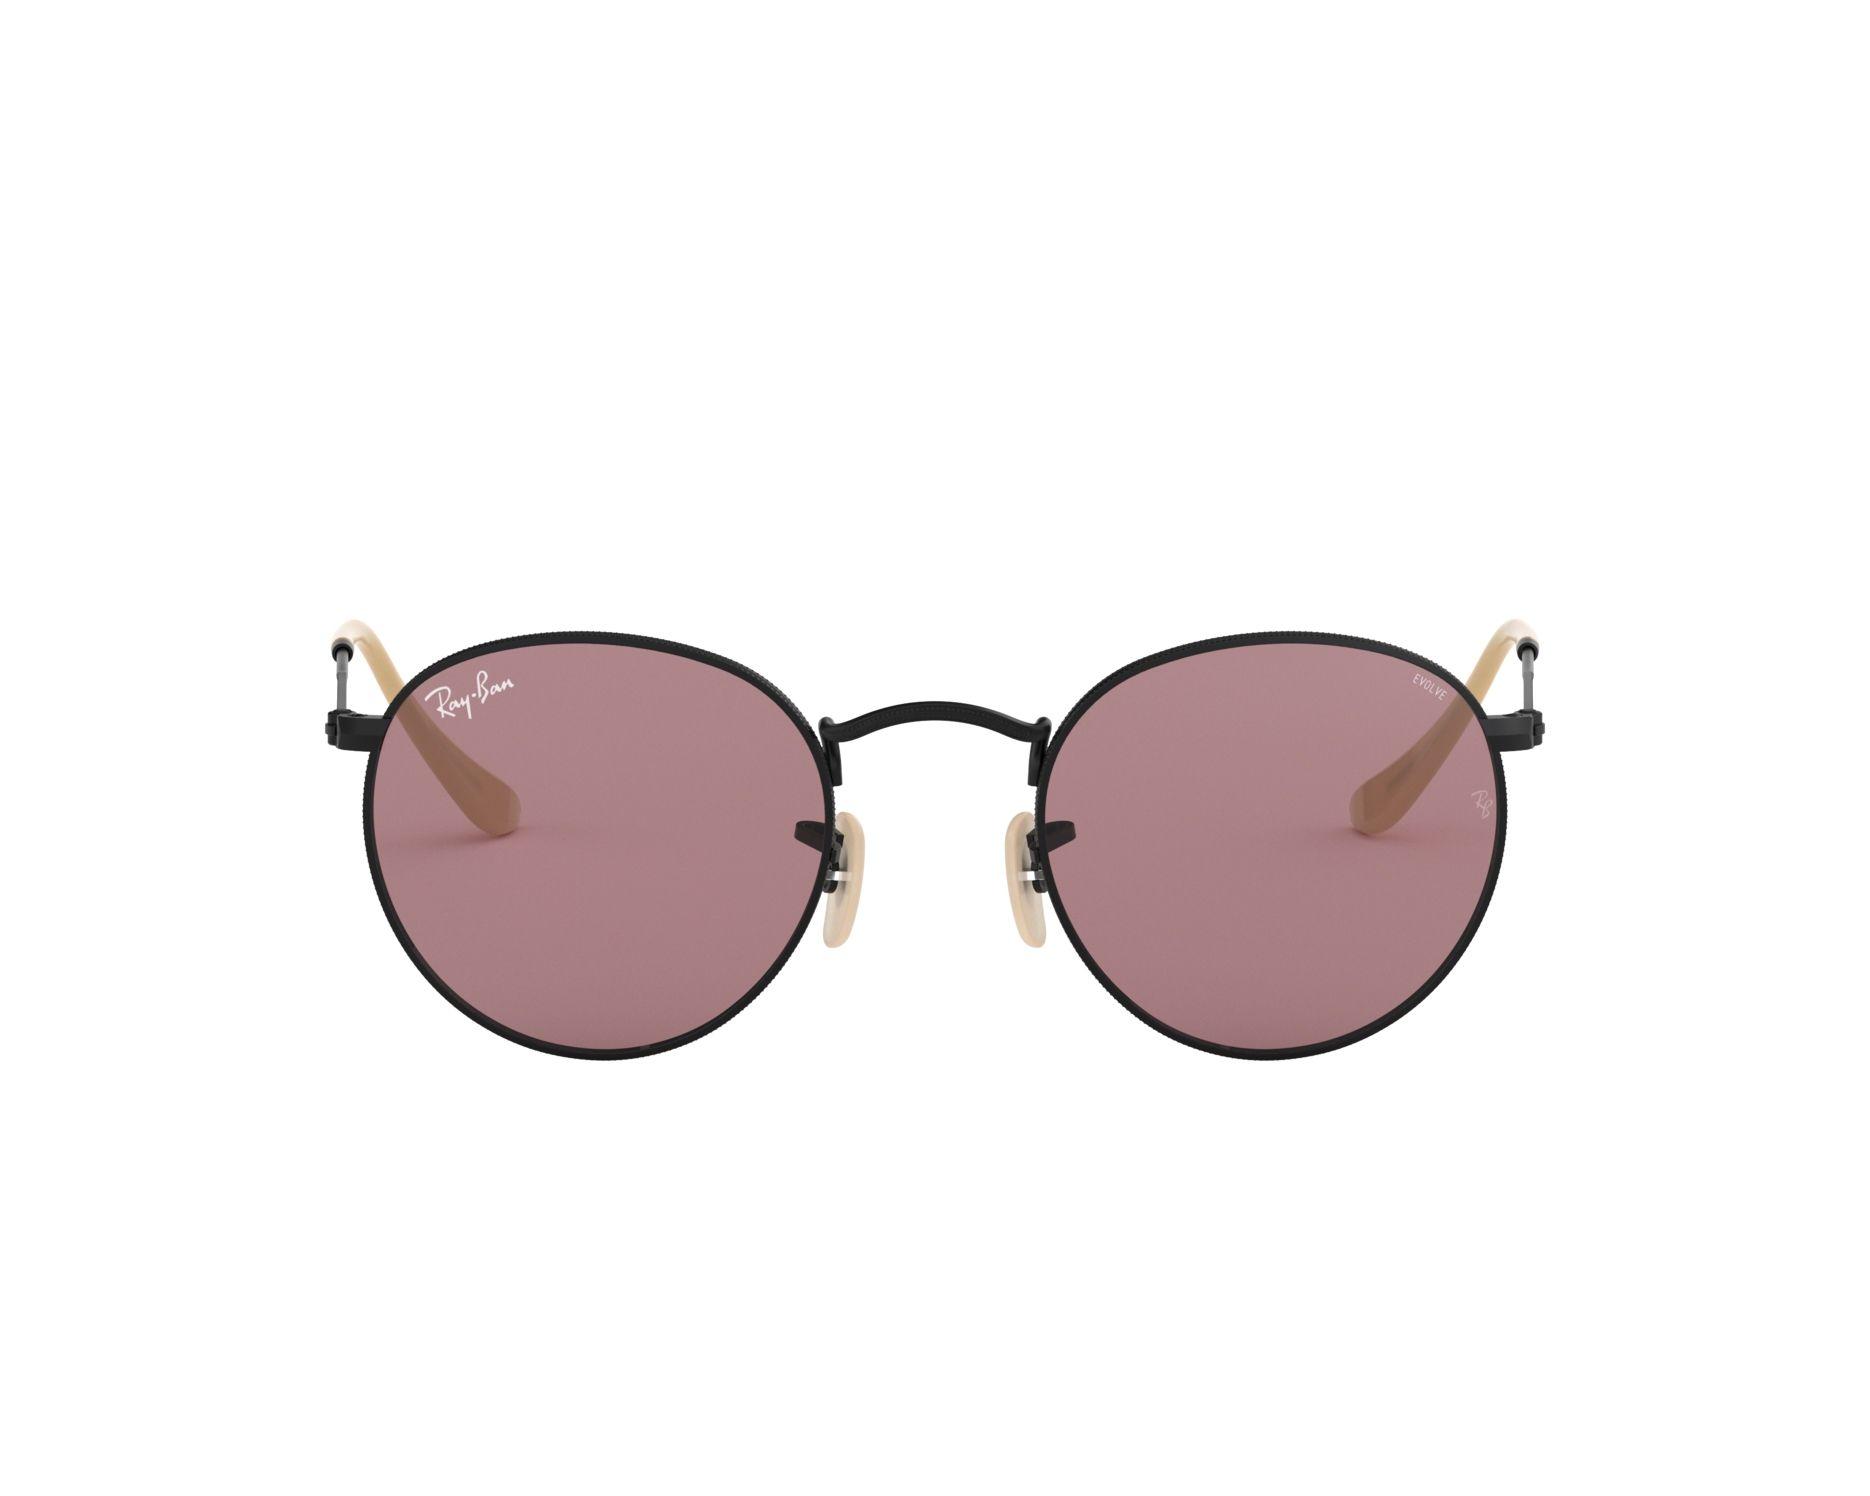 de81ed053 Sunglasses Ray-Ban RB-3447 9066Z0 50-21 Black 360 degree view 1